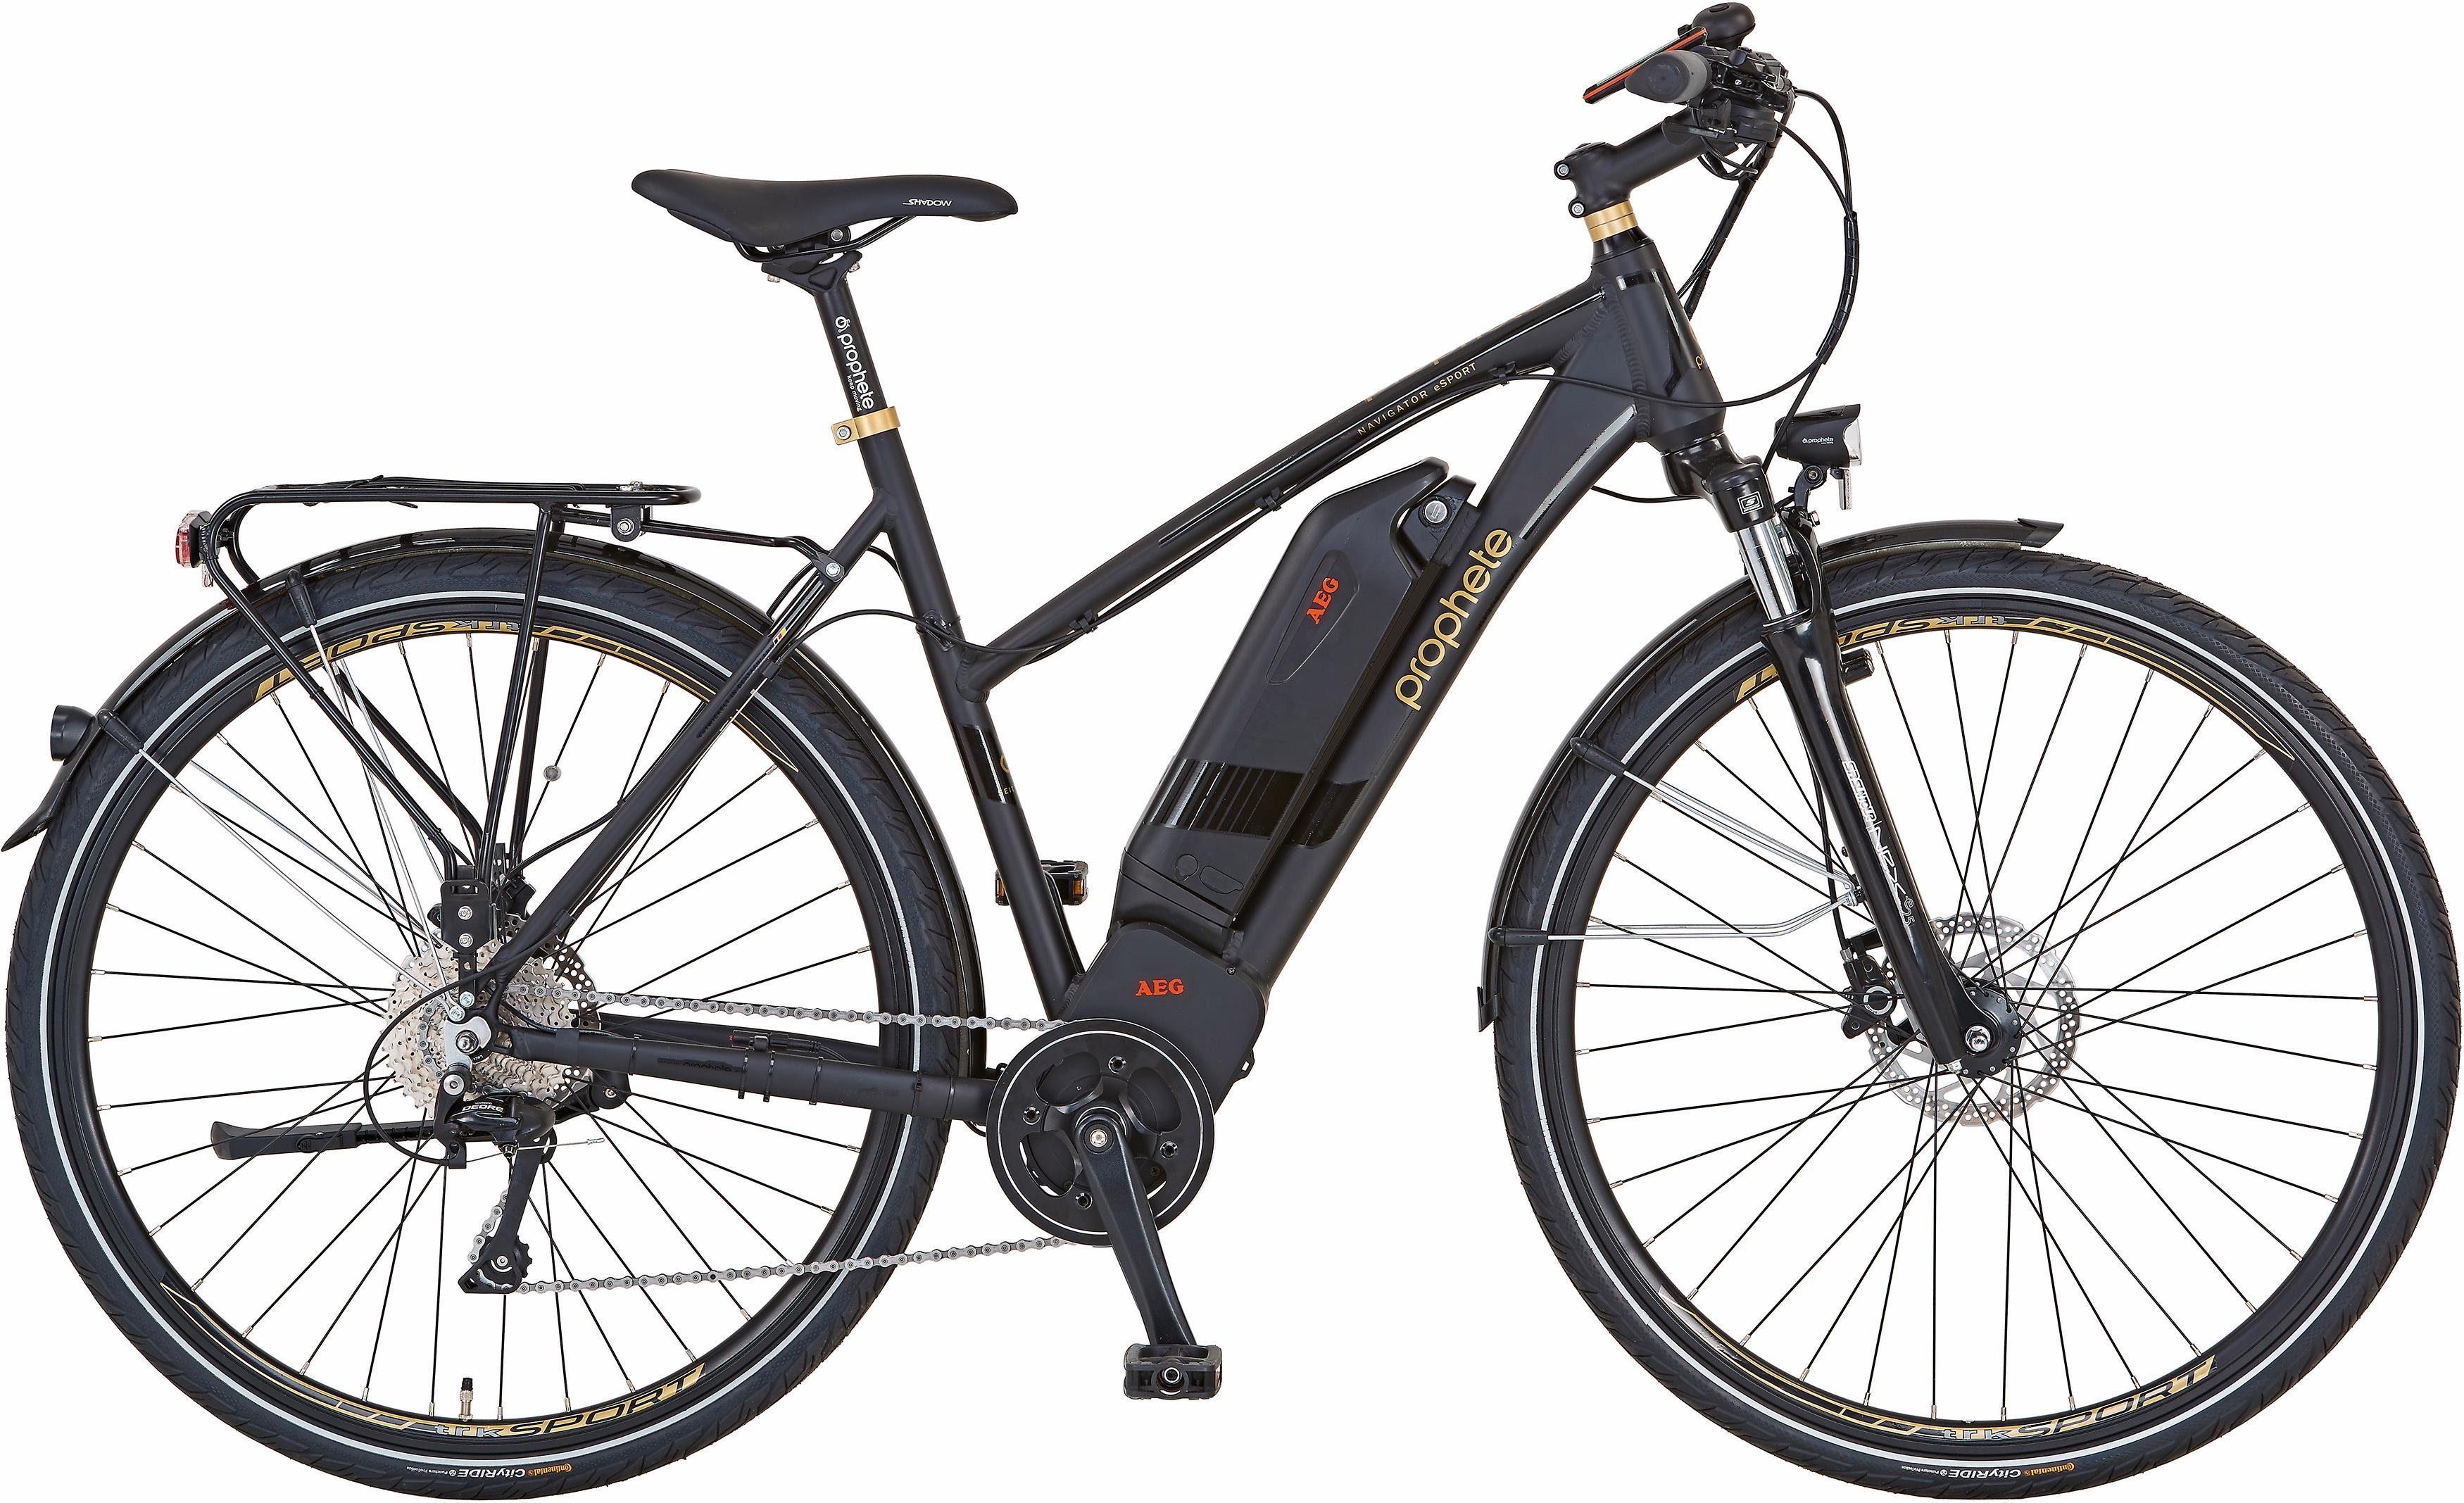 Prophete Damen E-Bike Trekking, 28 Zoll, 10 Gang Shimano Deore, Mittelmotor, 240 Watt, »AEG Navigator eSport«